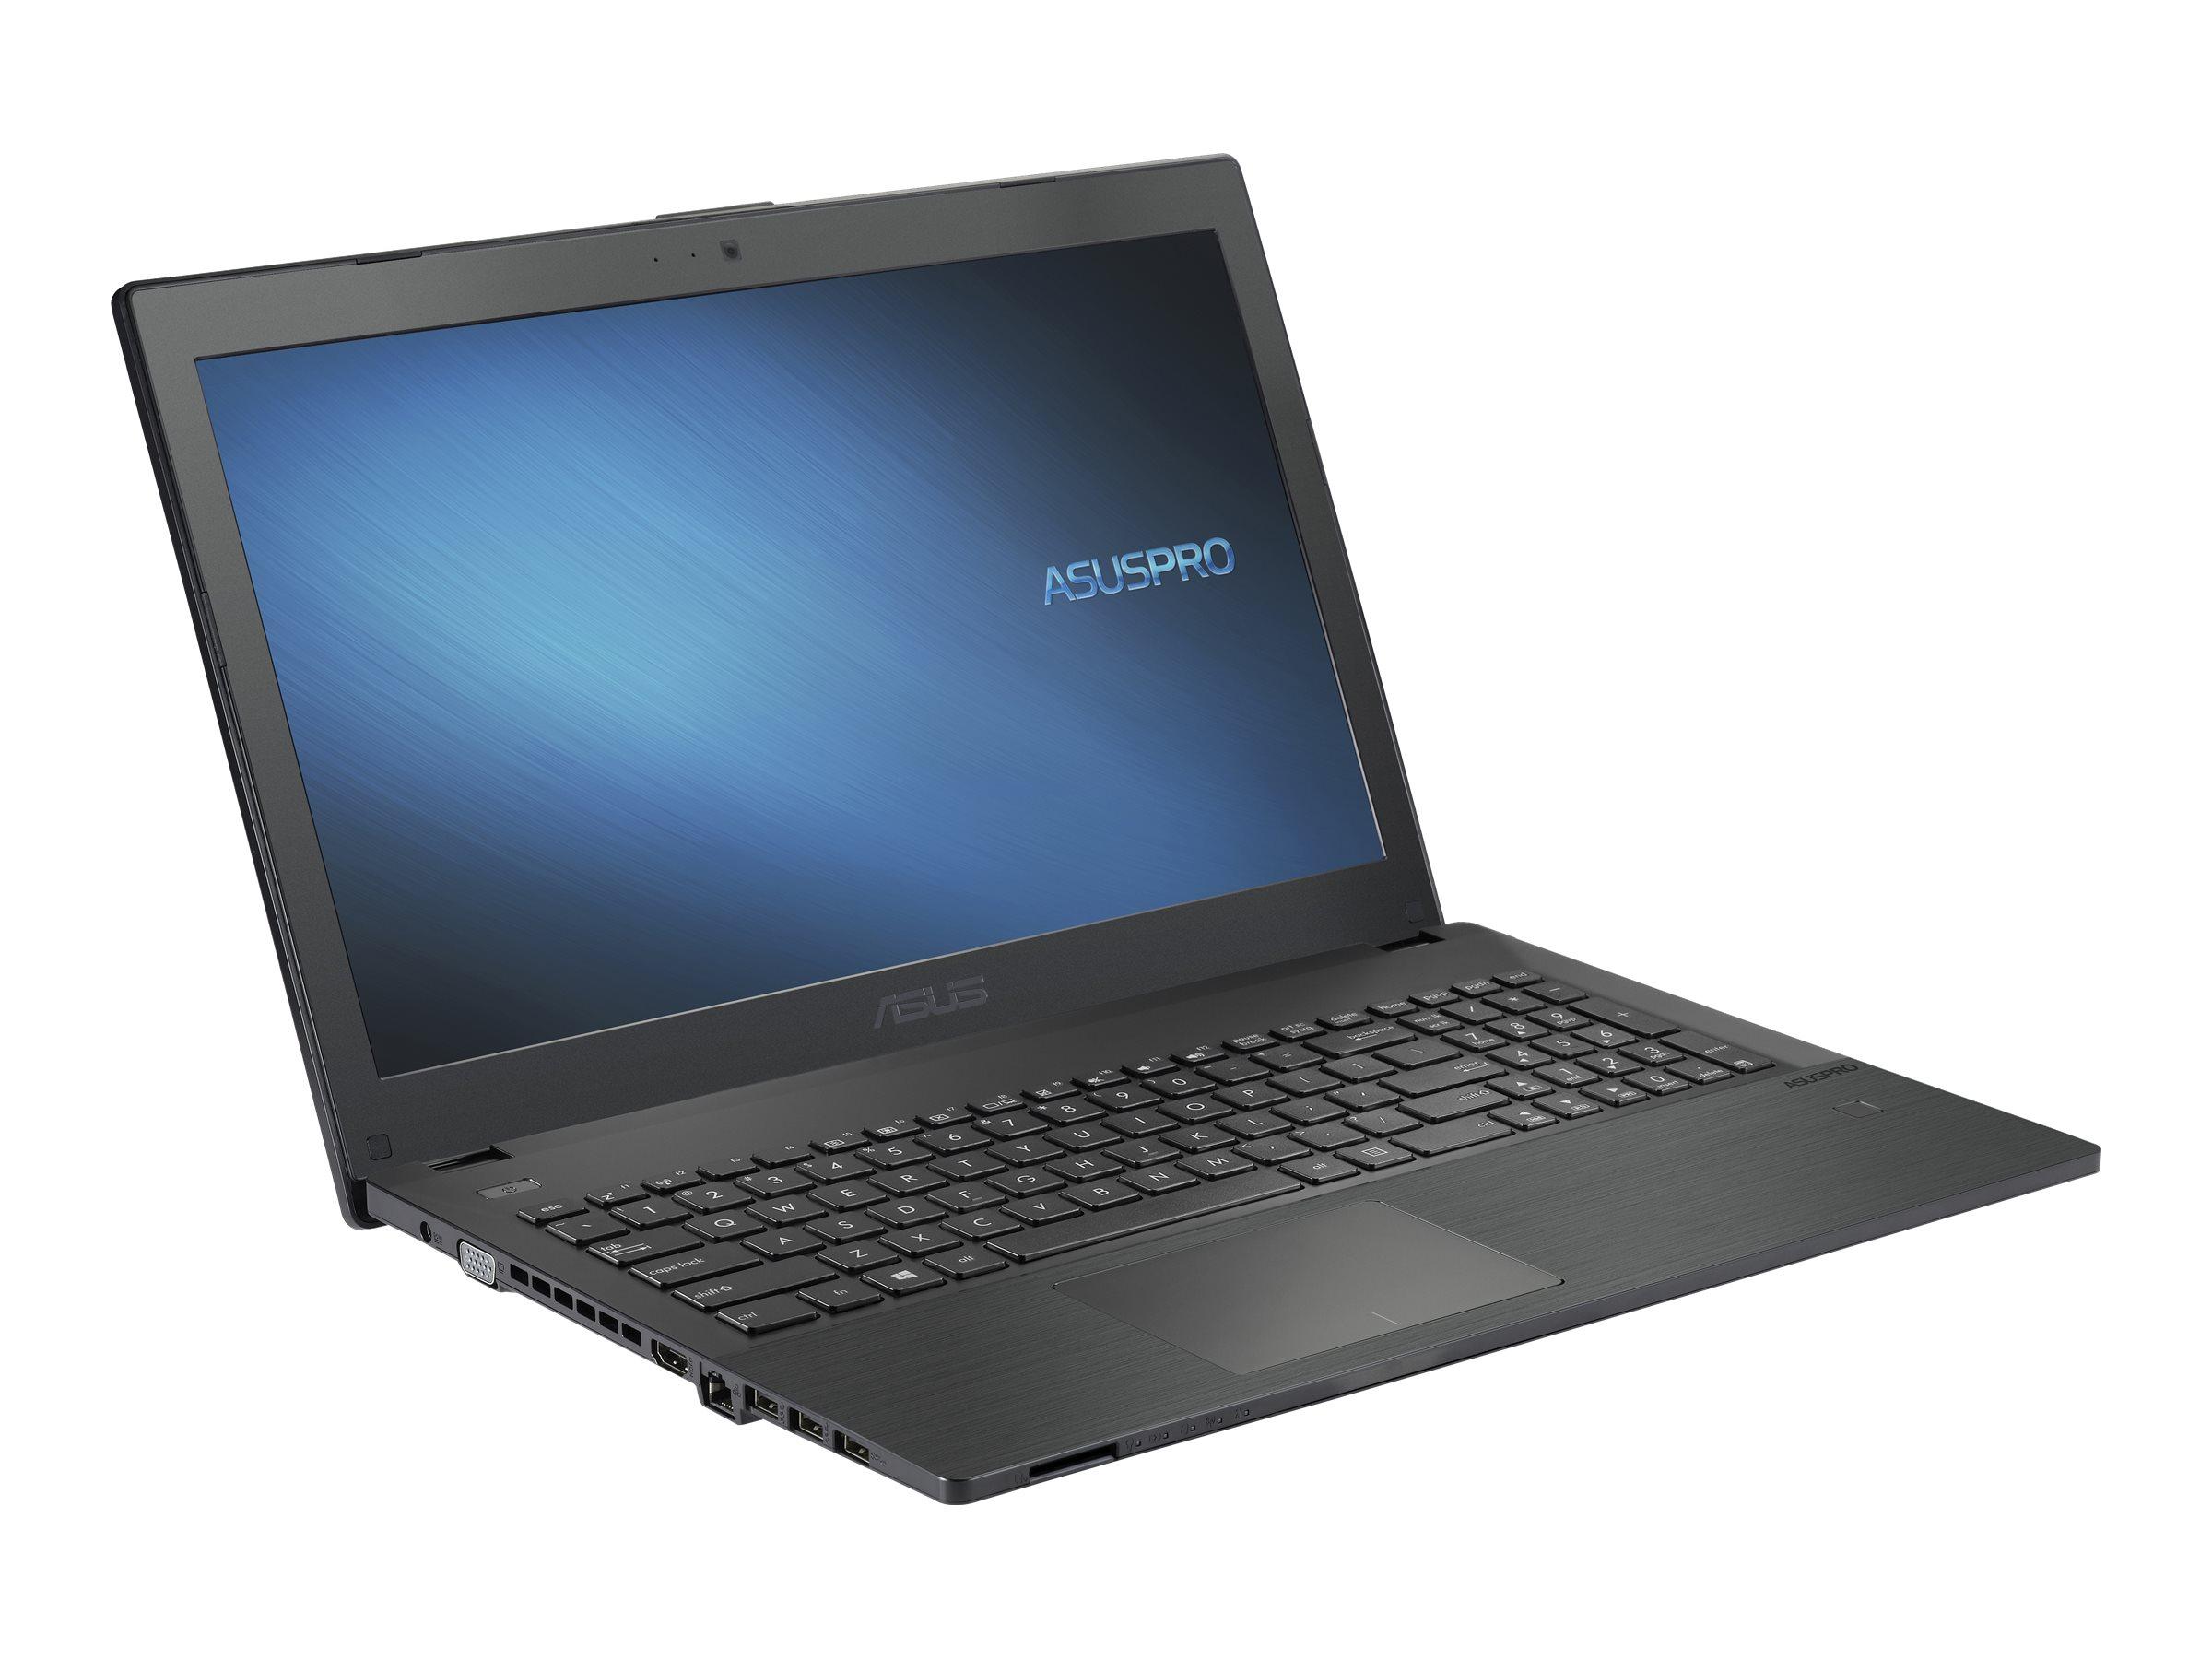 "ASUS ASUSPRO P2 P2540FA-DM0754RA - Core i5 10210U / 1.6 GHz - Windows 10 Pro National Academic - 8 GB RAM - 256 GB SSD NVMe - DVD-Writer - 39.6 cm (15.6"")"